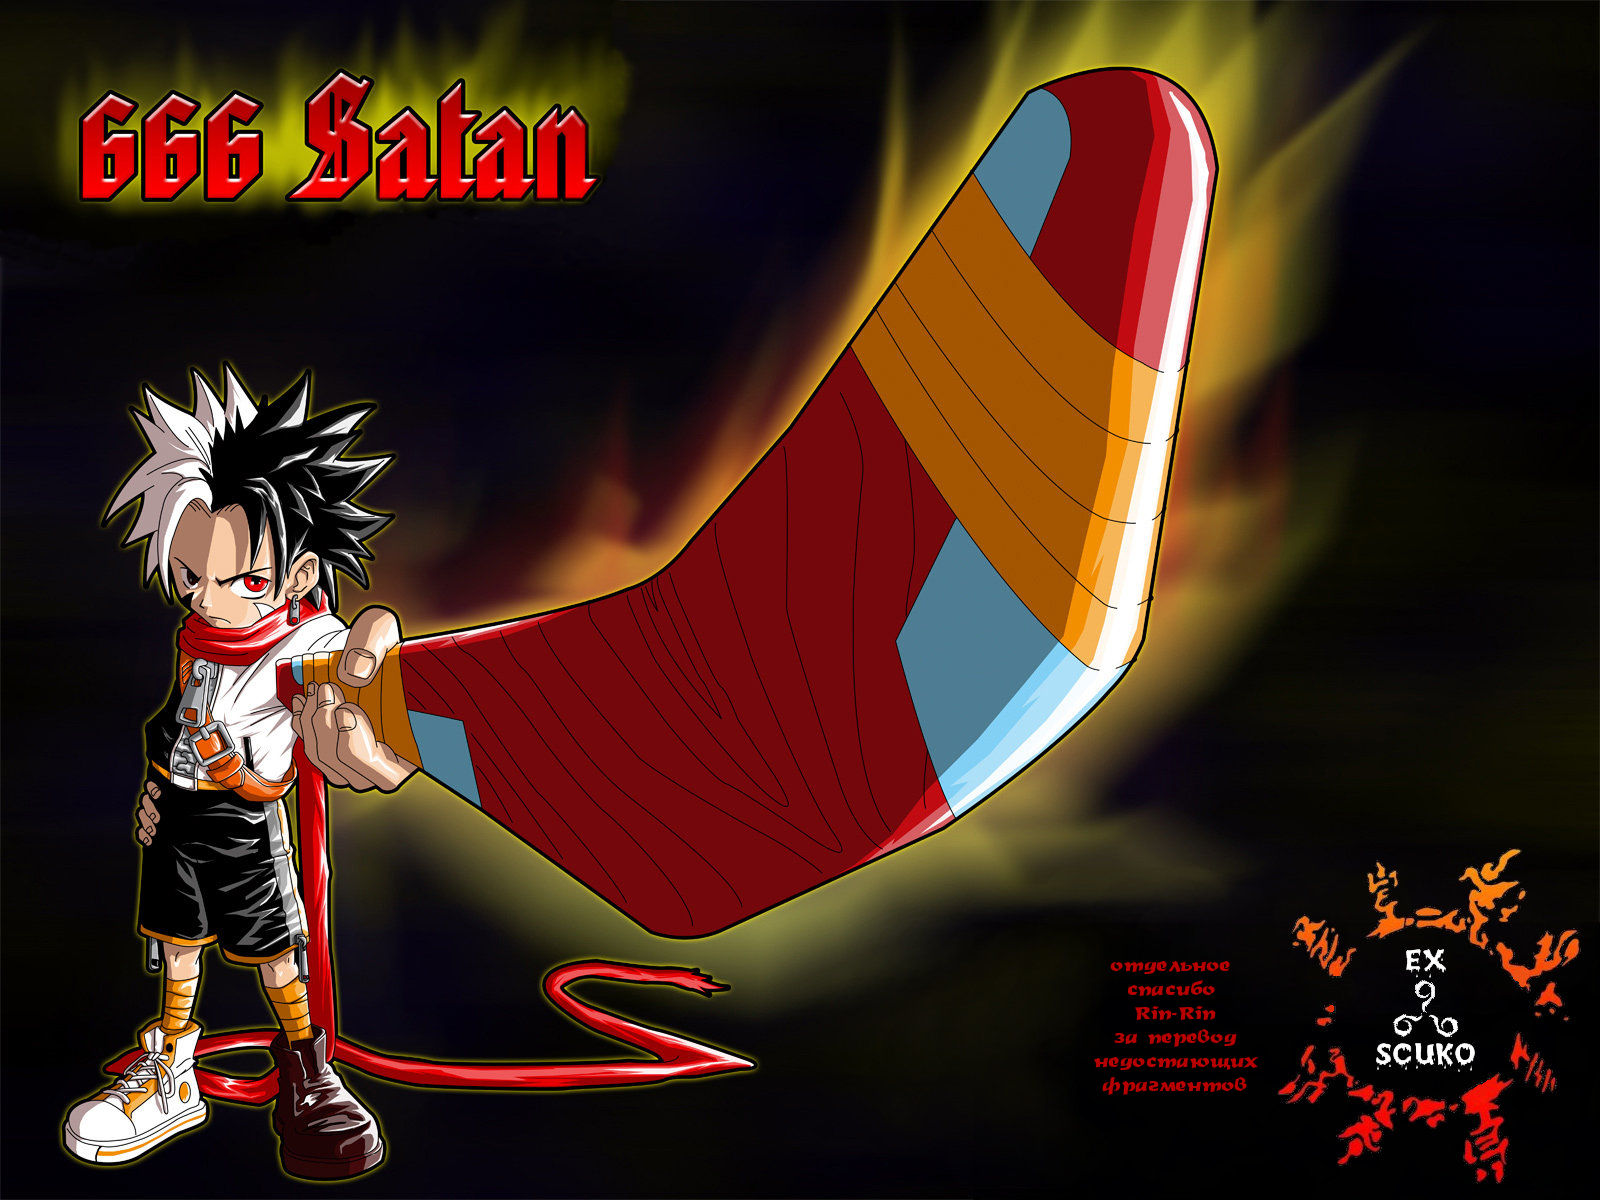 Манга Онлайн - 666 Satan / 666 Сатана 14 # 53 Связи - Страница №1 - 666 Satan